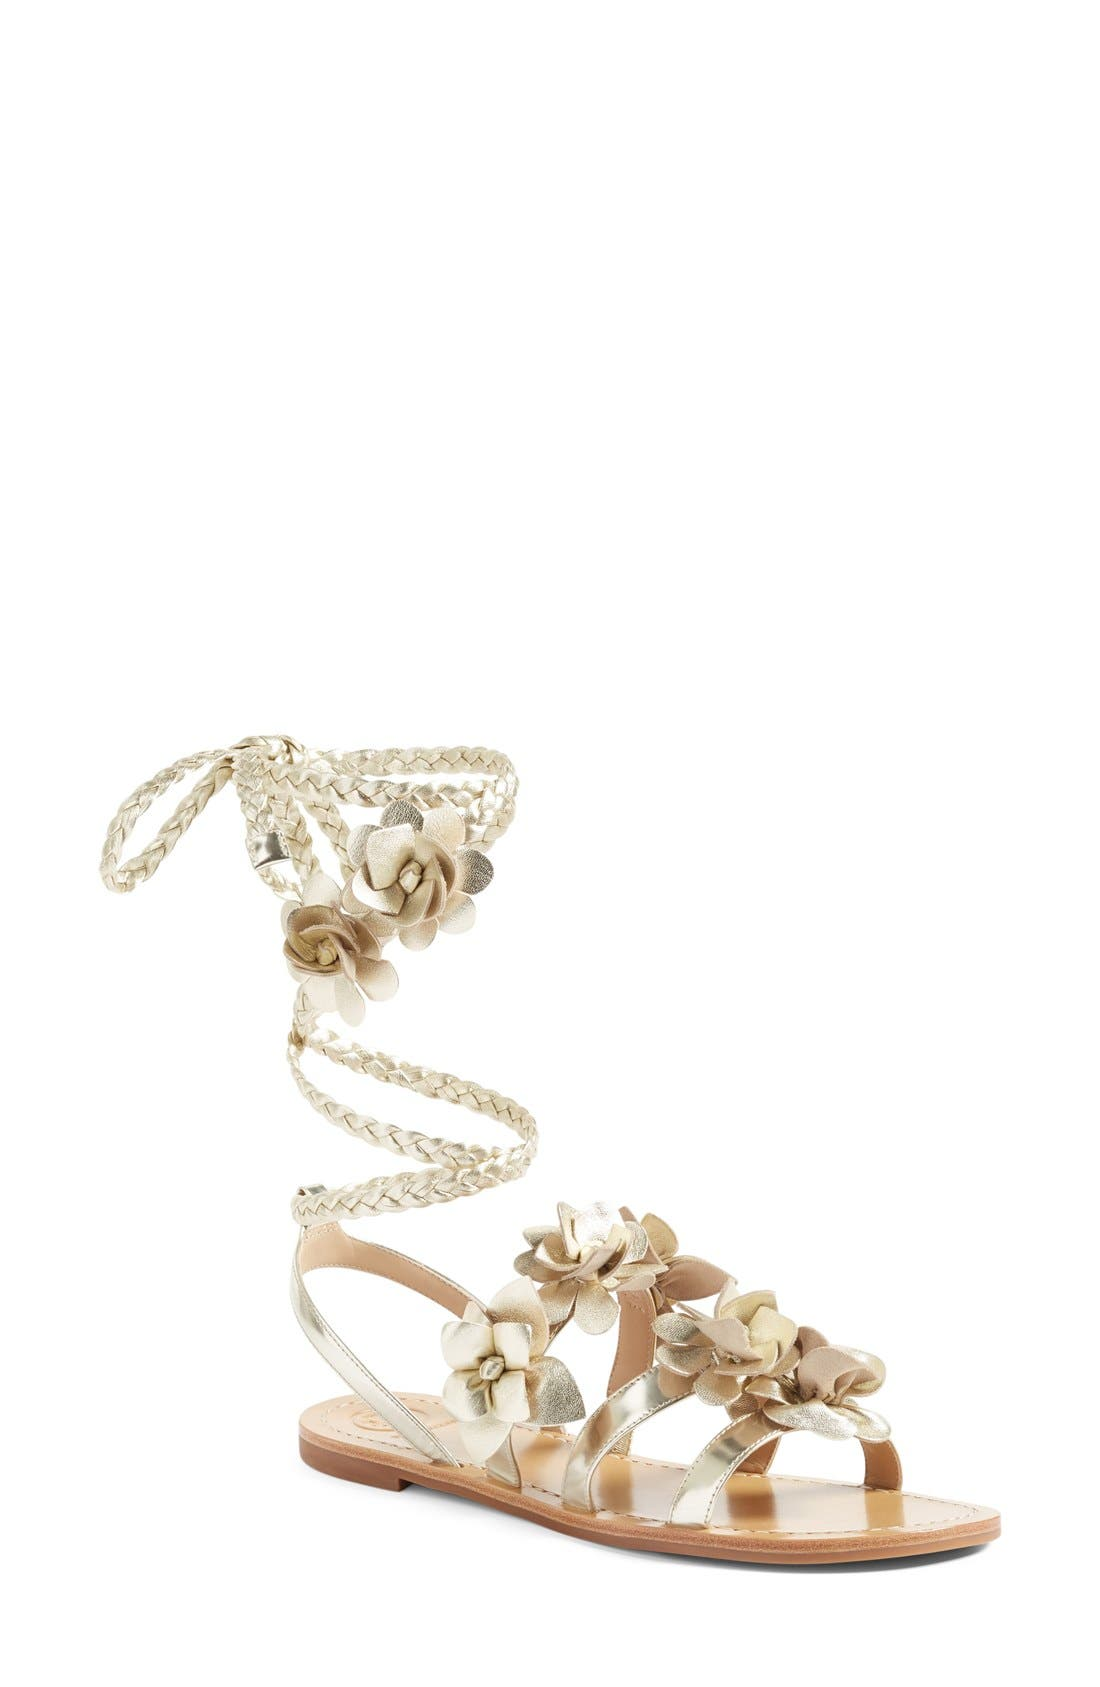 TORY BURCH Blossom Gladiator Sandal